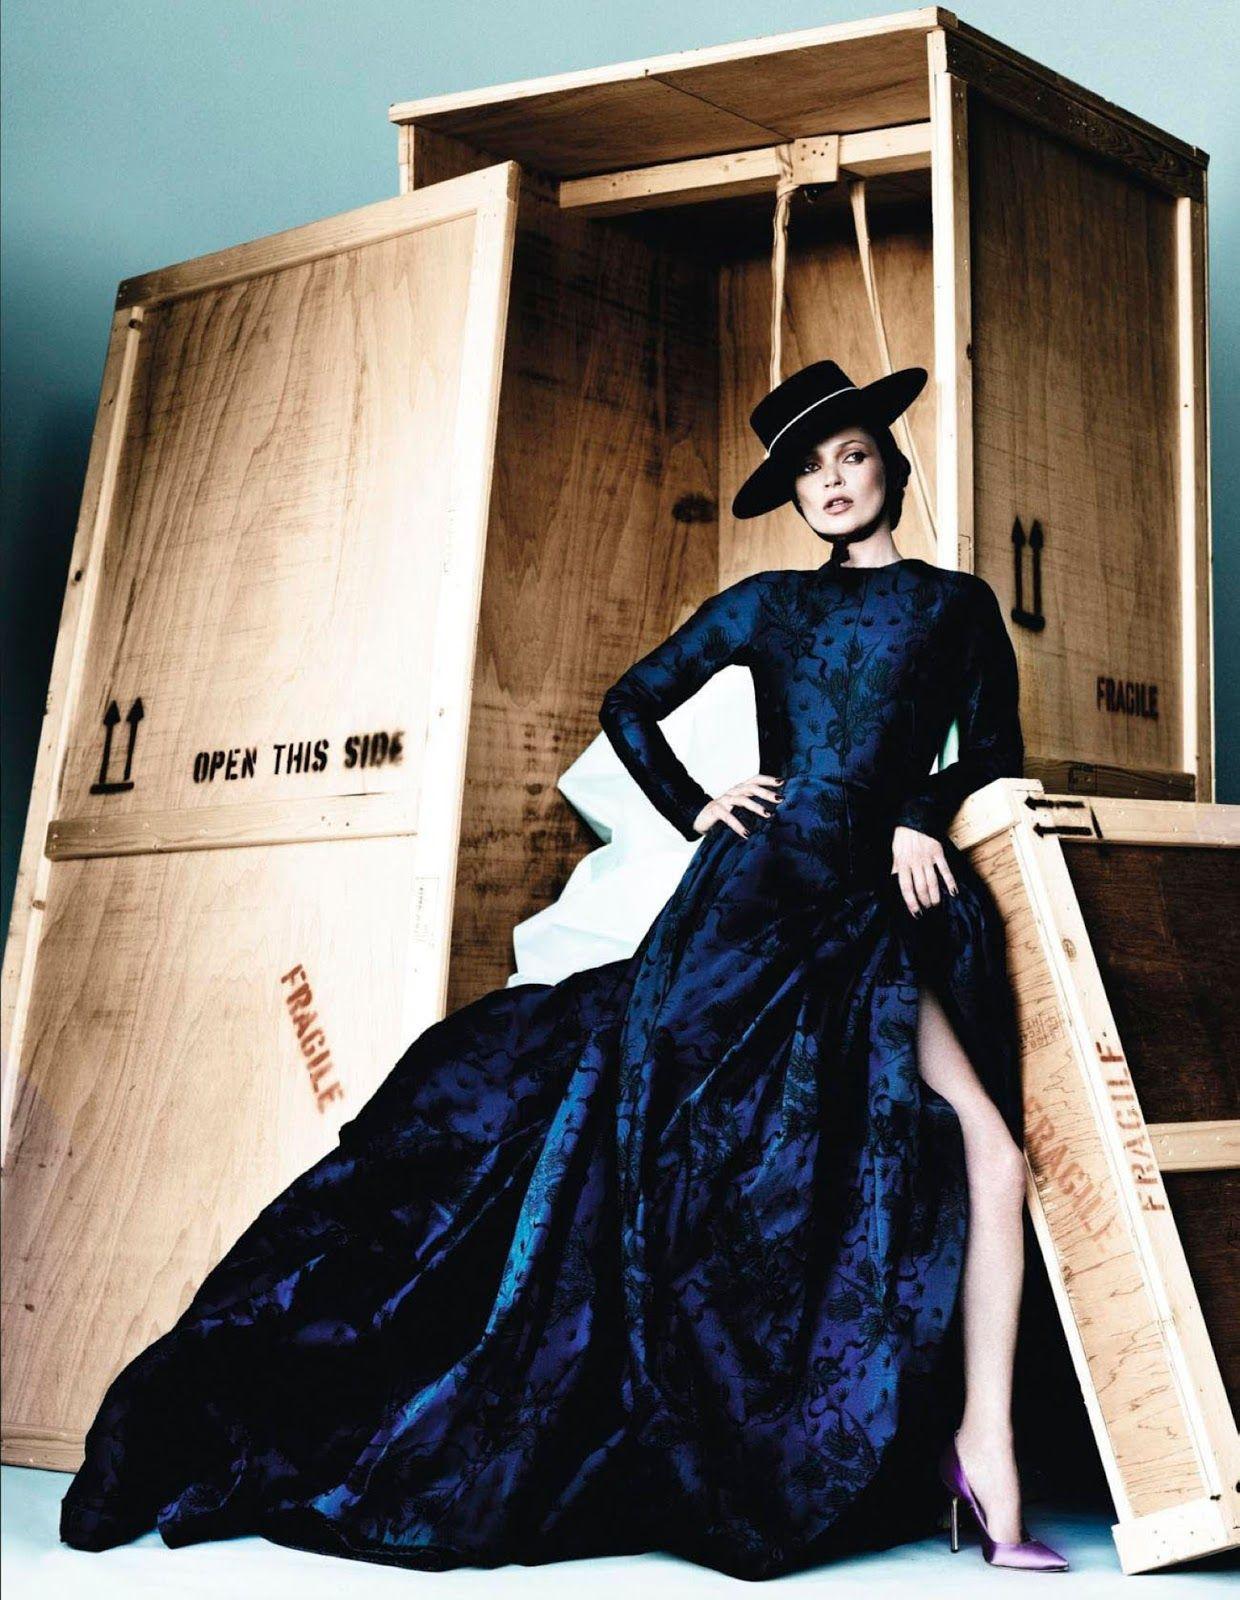 ¡Va por ustedes! | Kate Moss by Mario Testino for Vogue España, December 2012 #Valentino #couture